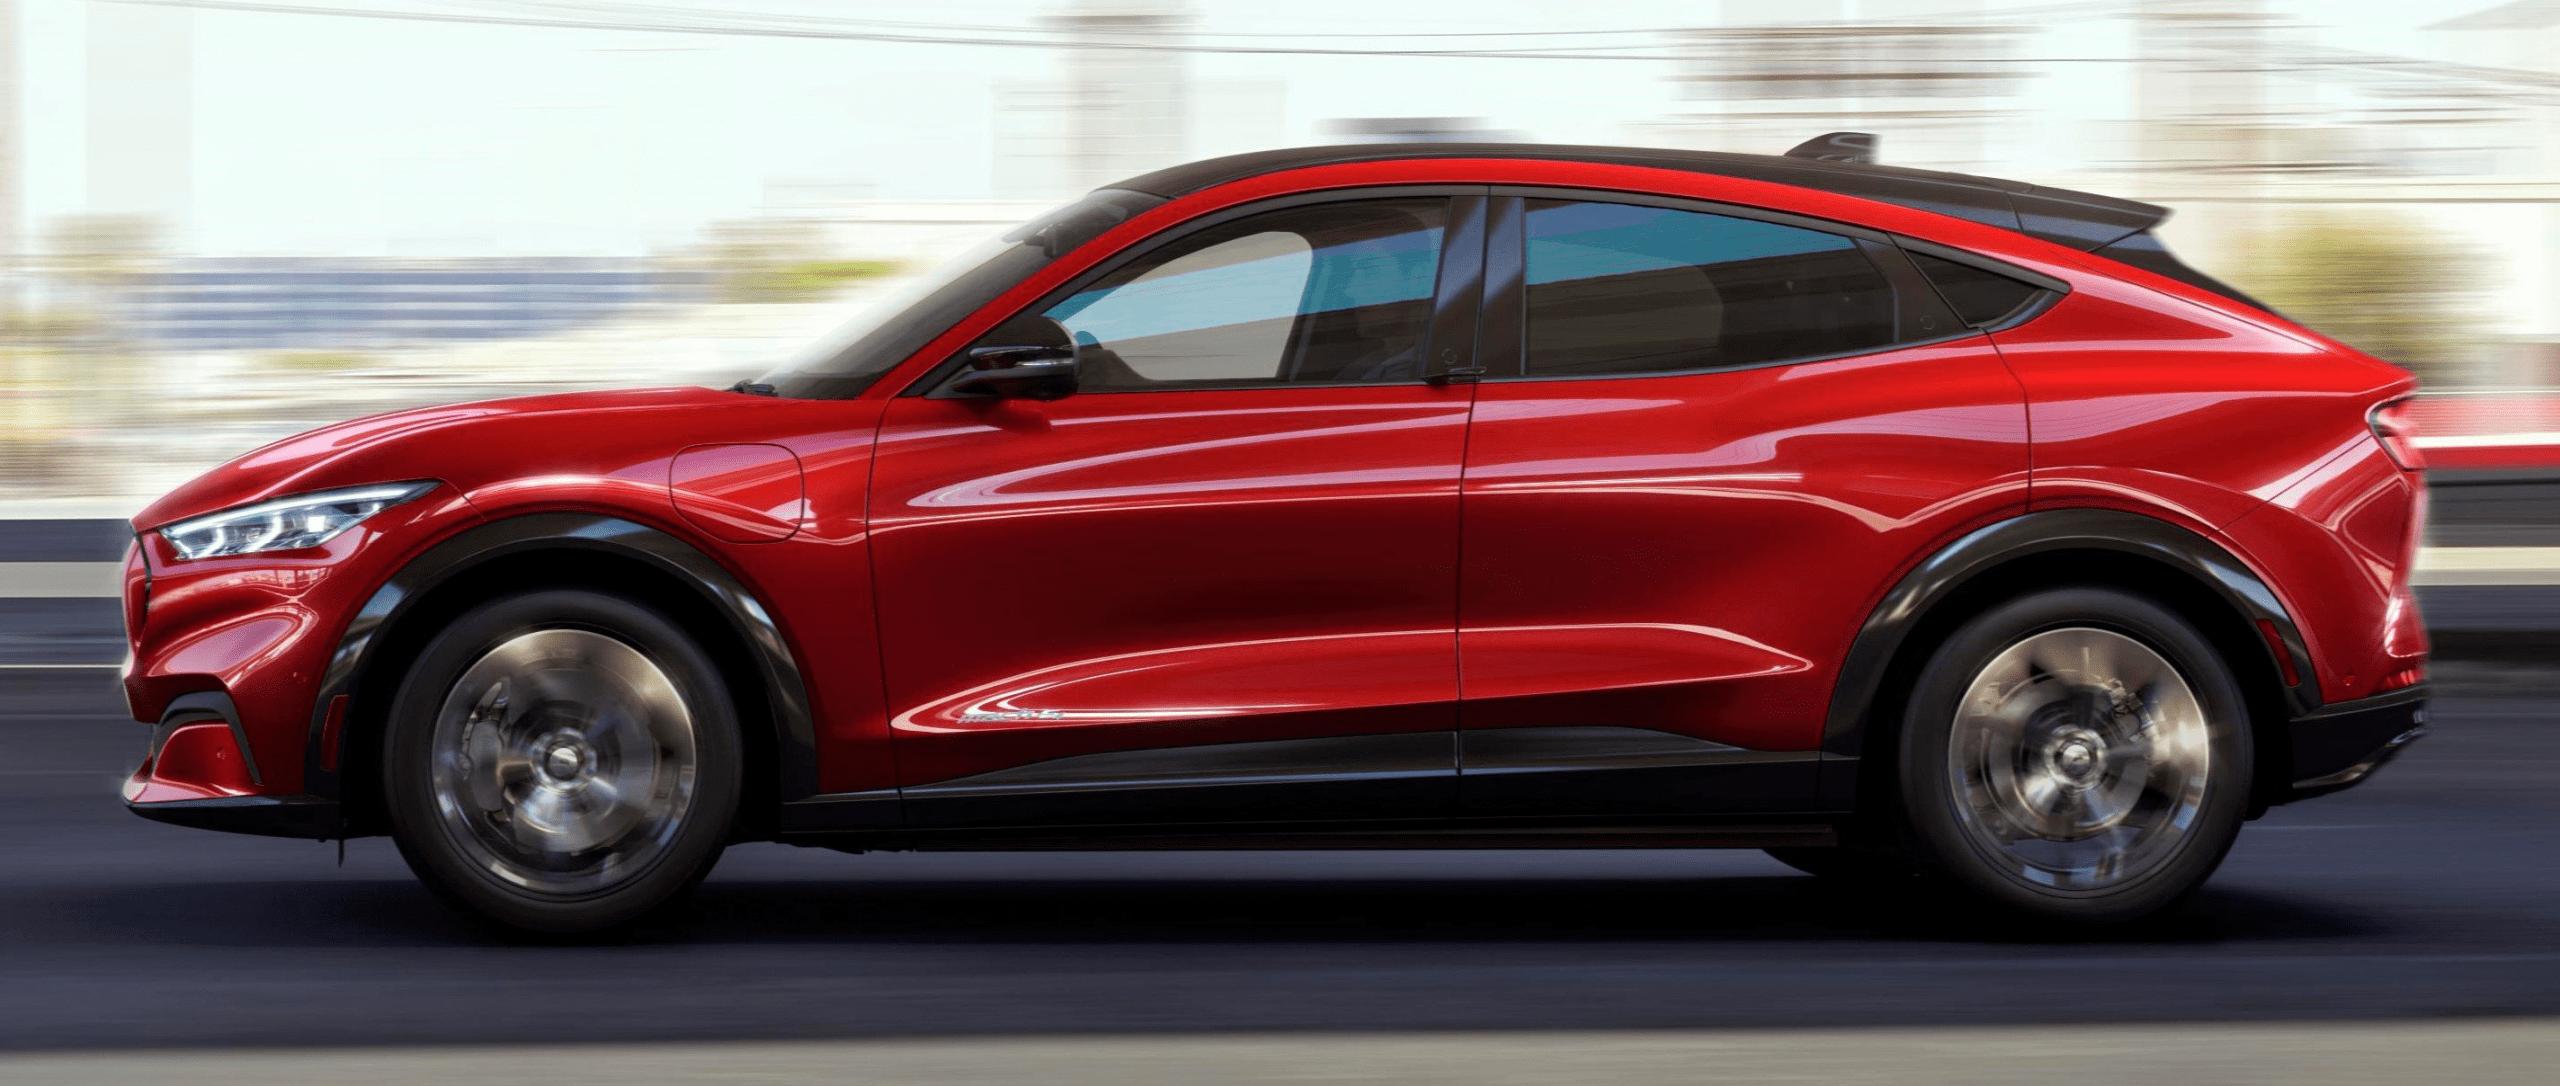 2021 Hyundai Equus Pricing In 2020 Ford Mustang Ford Mustang Bullitt New Ford Mustang